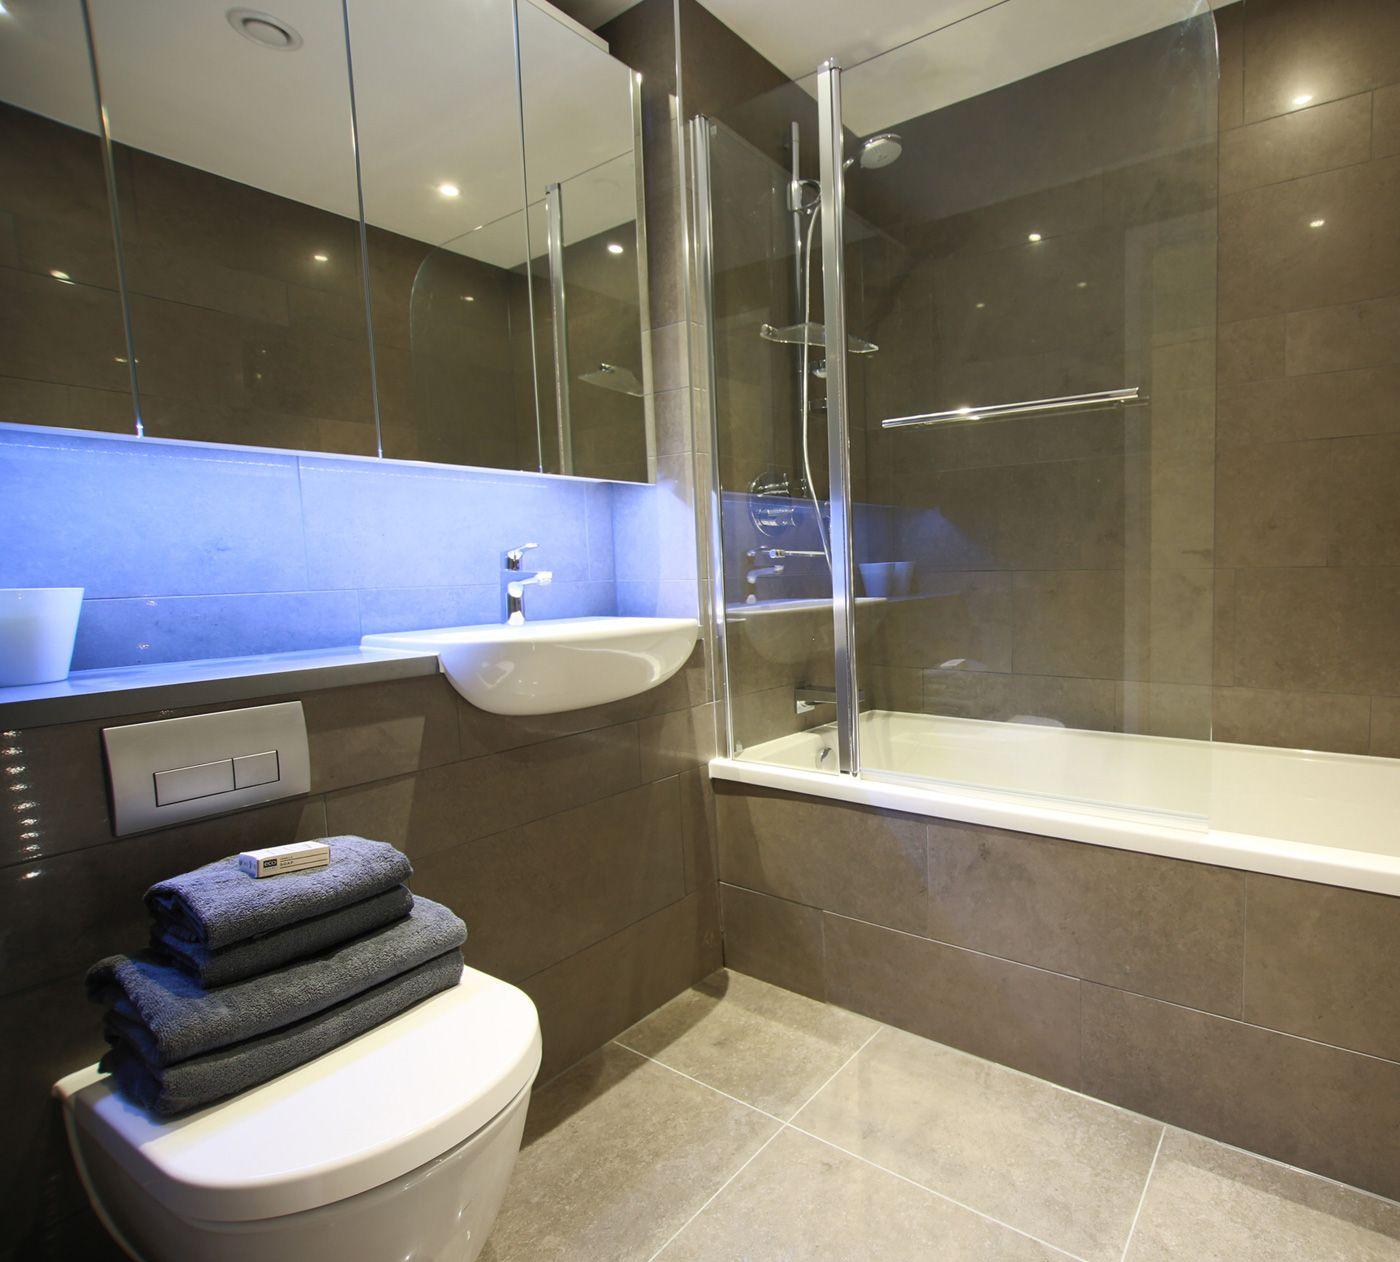 1 Bedroom Apartments In London: REGENT APARTMENTS: LUXURY 1, 2, 3 & 4 BEDROOM APARTMENTS